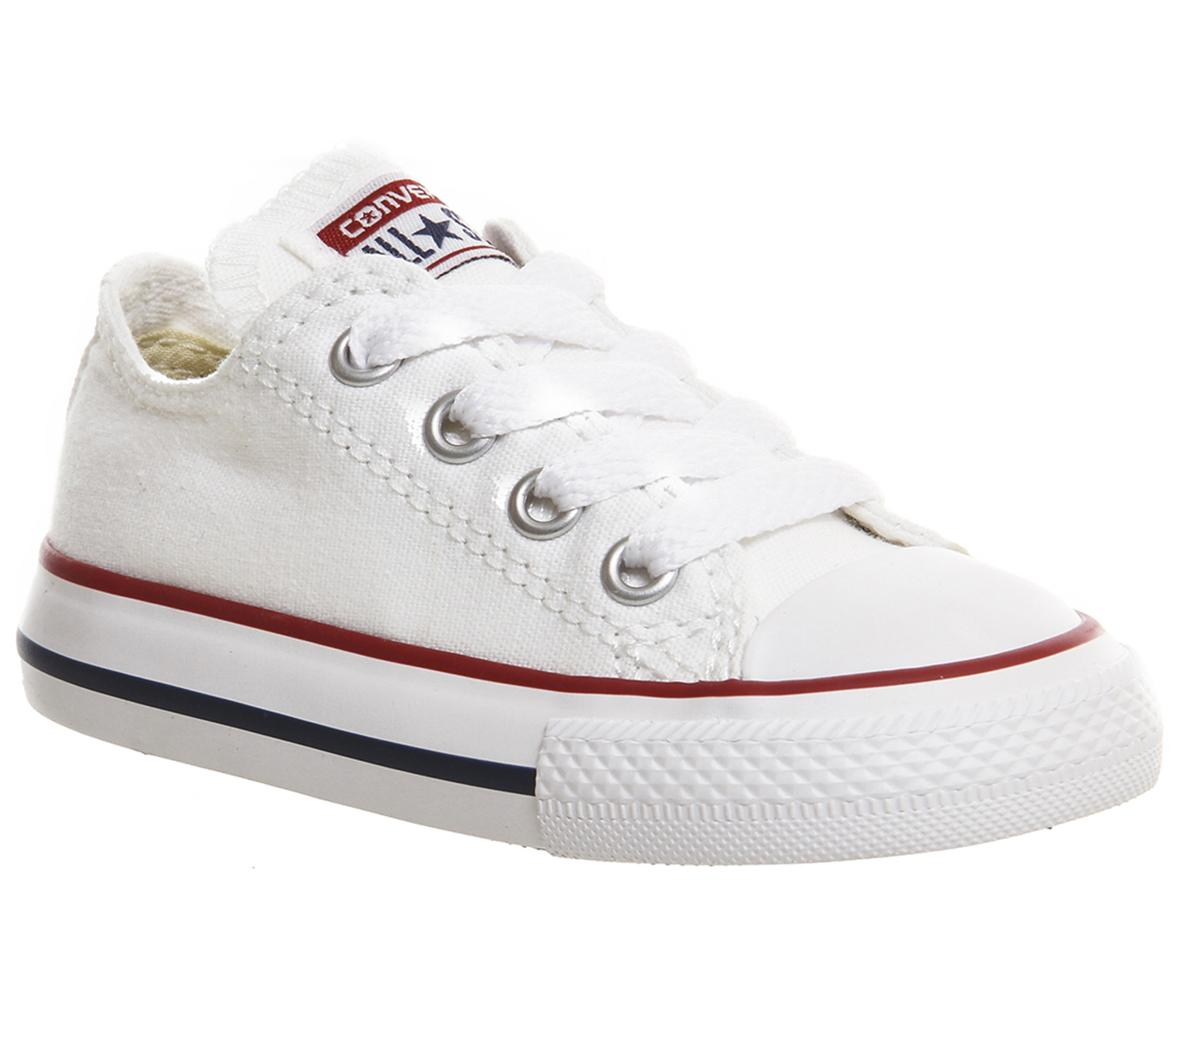 91197c7a254d Converse All Star Low Infant Shoes White - Unisex